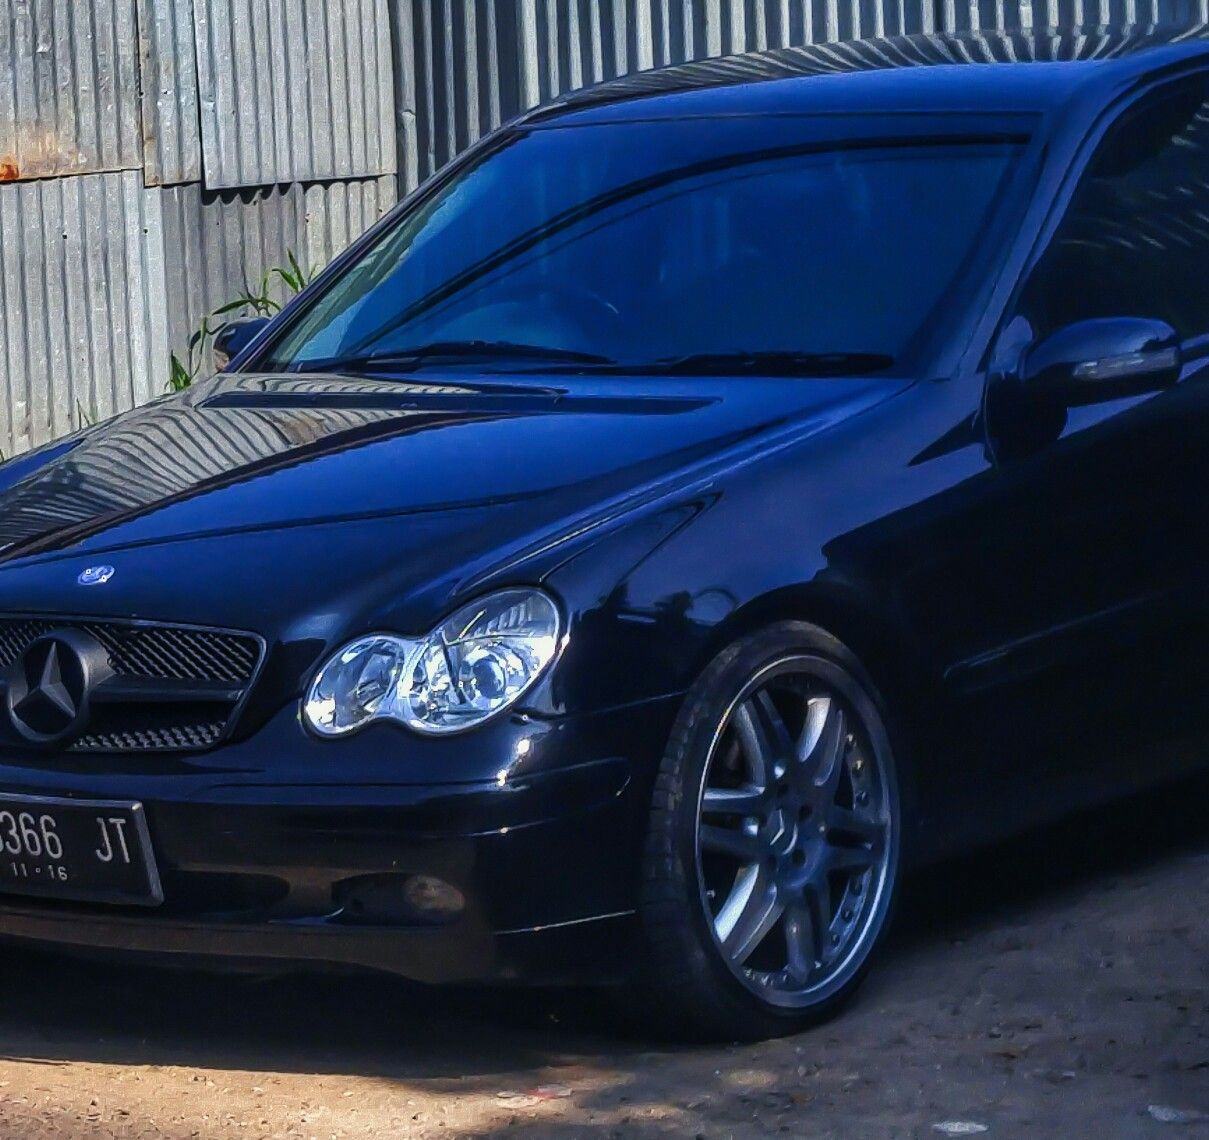 Mercedes Benz C240 Price: Mercedes Benz C-Klasse W203